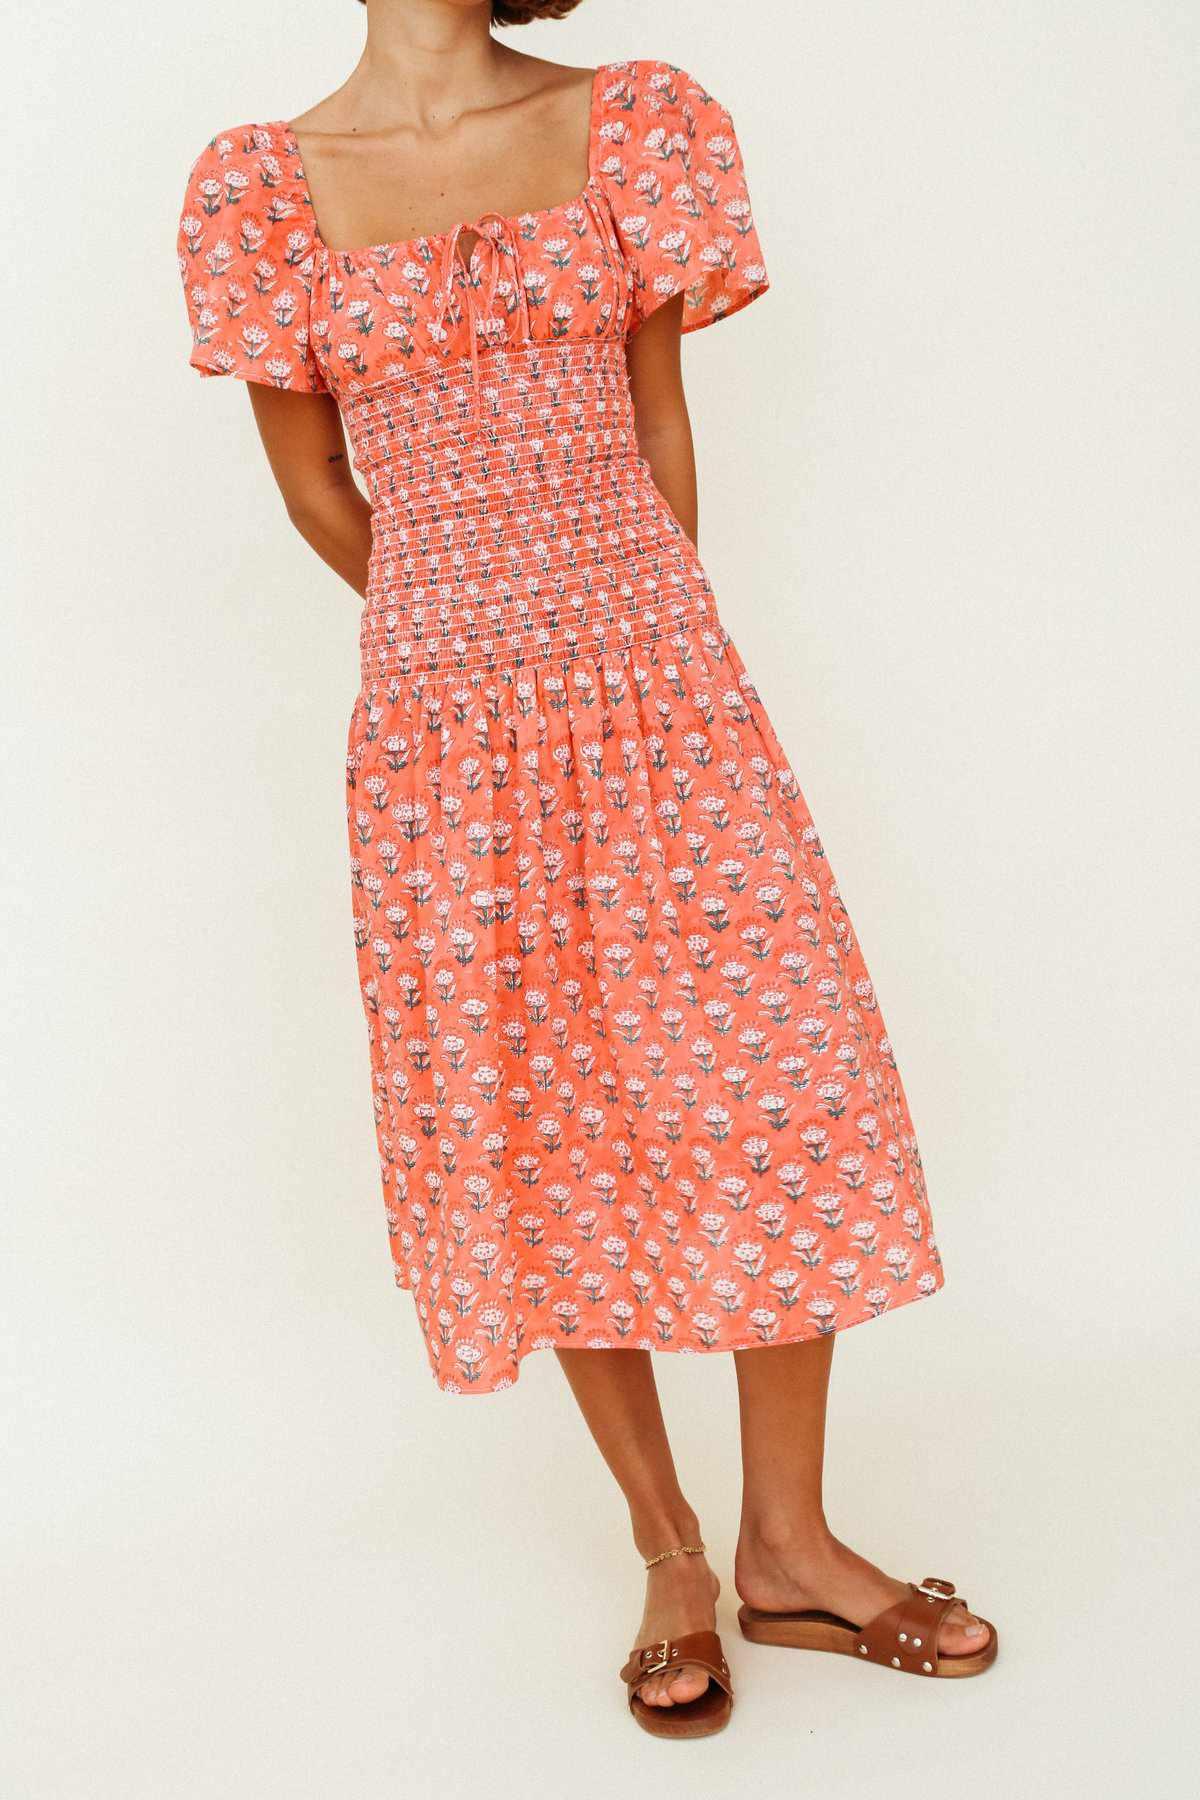 Ciao Lucia Chiara Dress Coral Floral Block Print $395